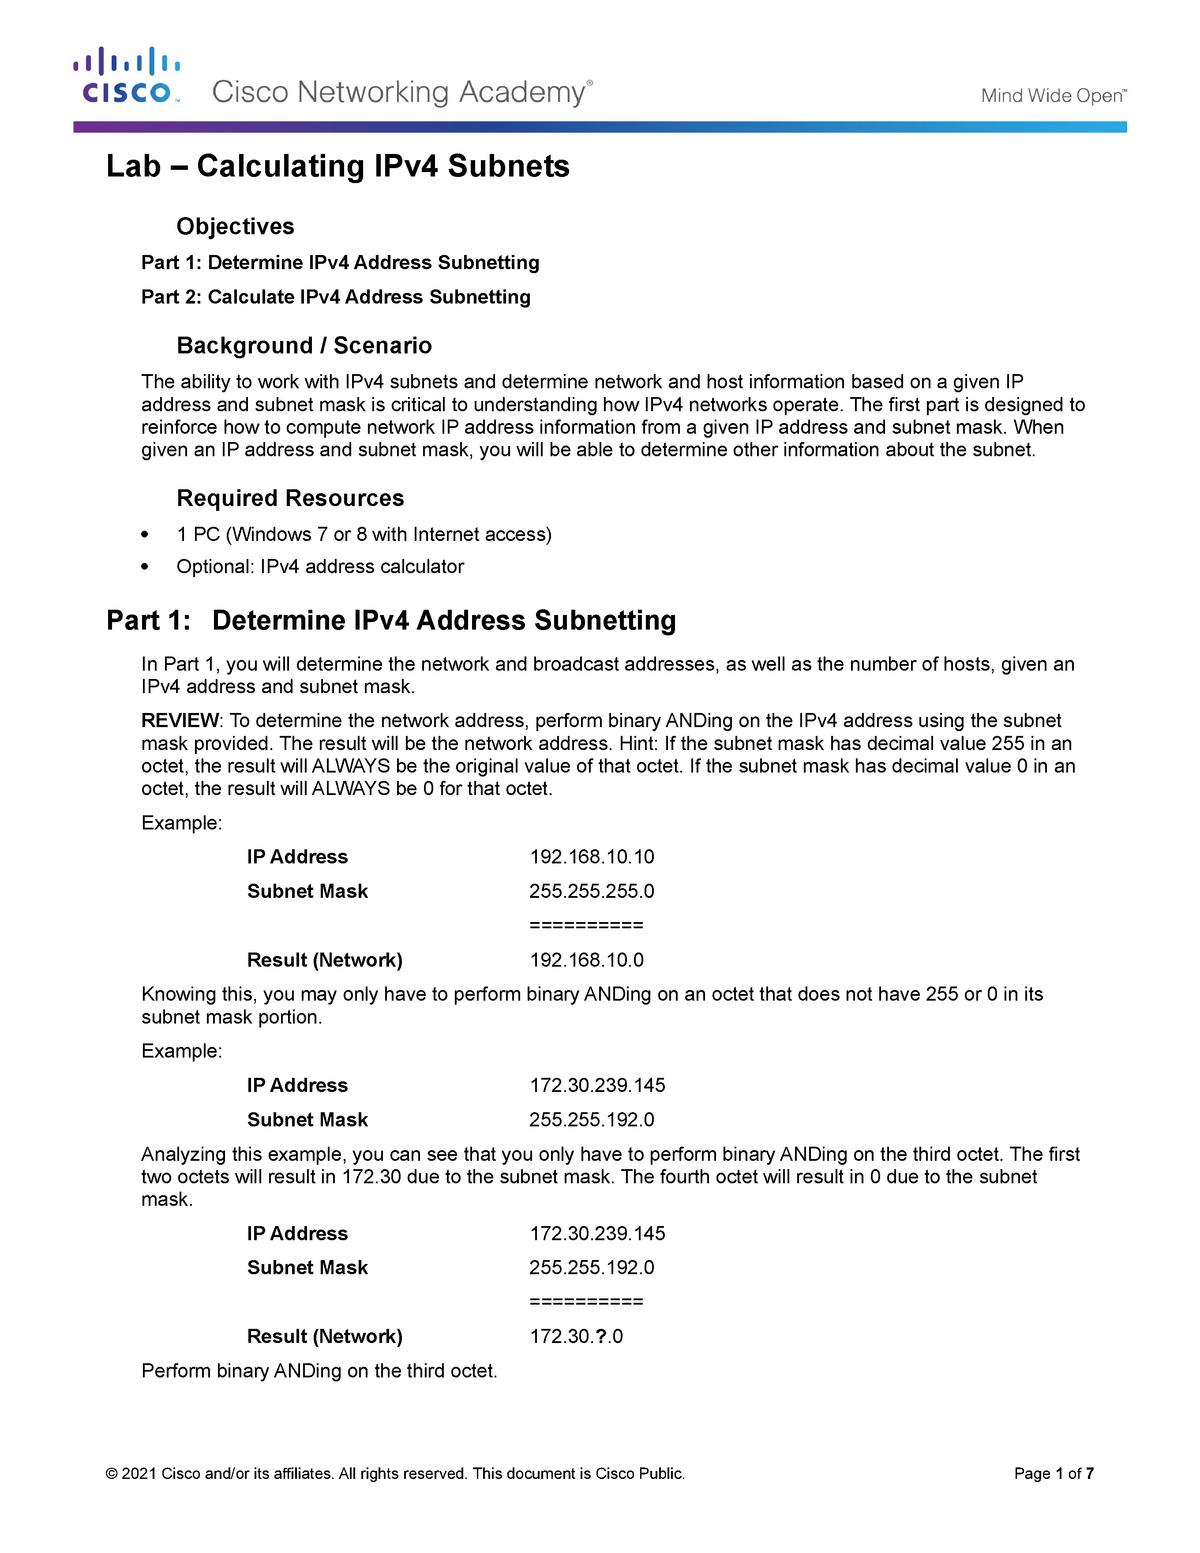 8 1 4 6 Lab - Calculating IPv4 Subnets - Software - StuDocu